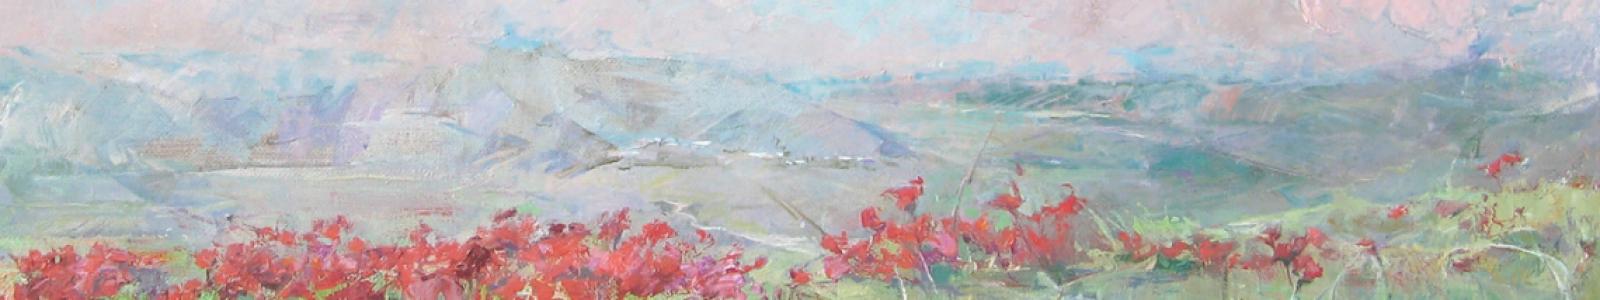 Gallery Painter Nikoloz Gabunia